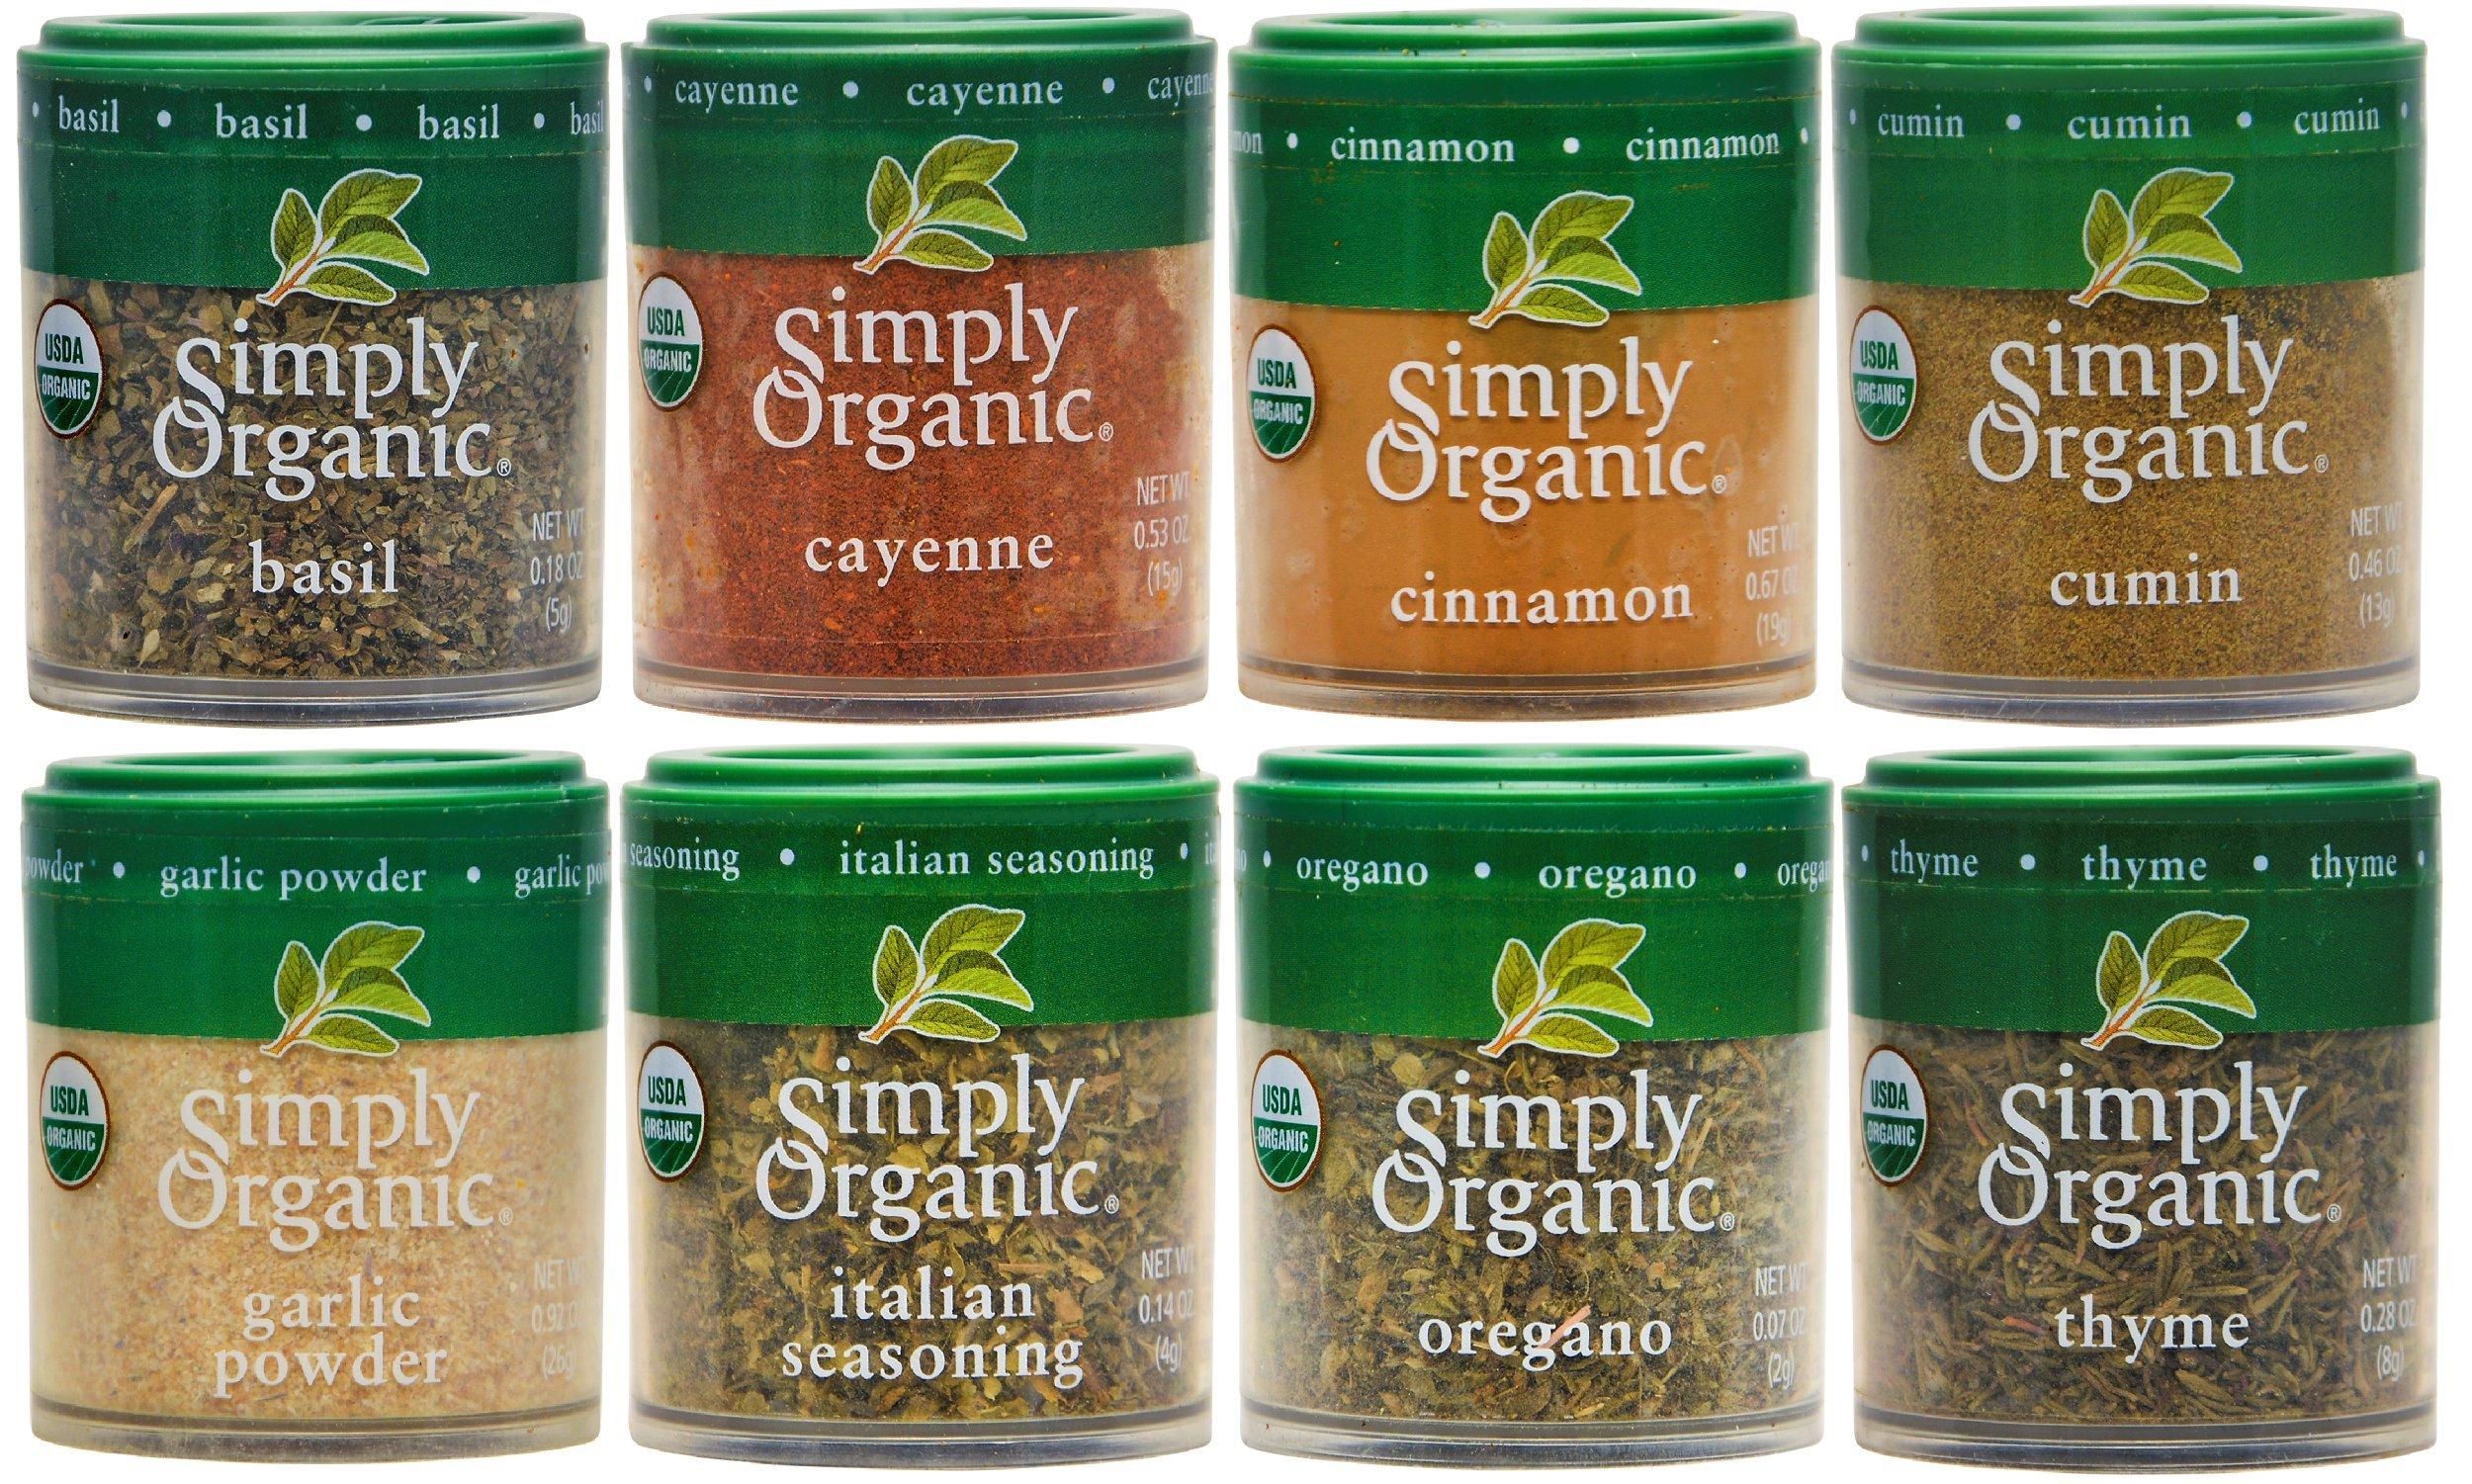 Simply Organic Basics 8 Spices Gift Set 91i8tefScPL